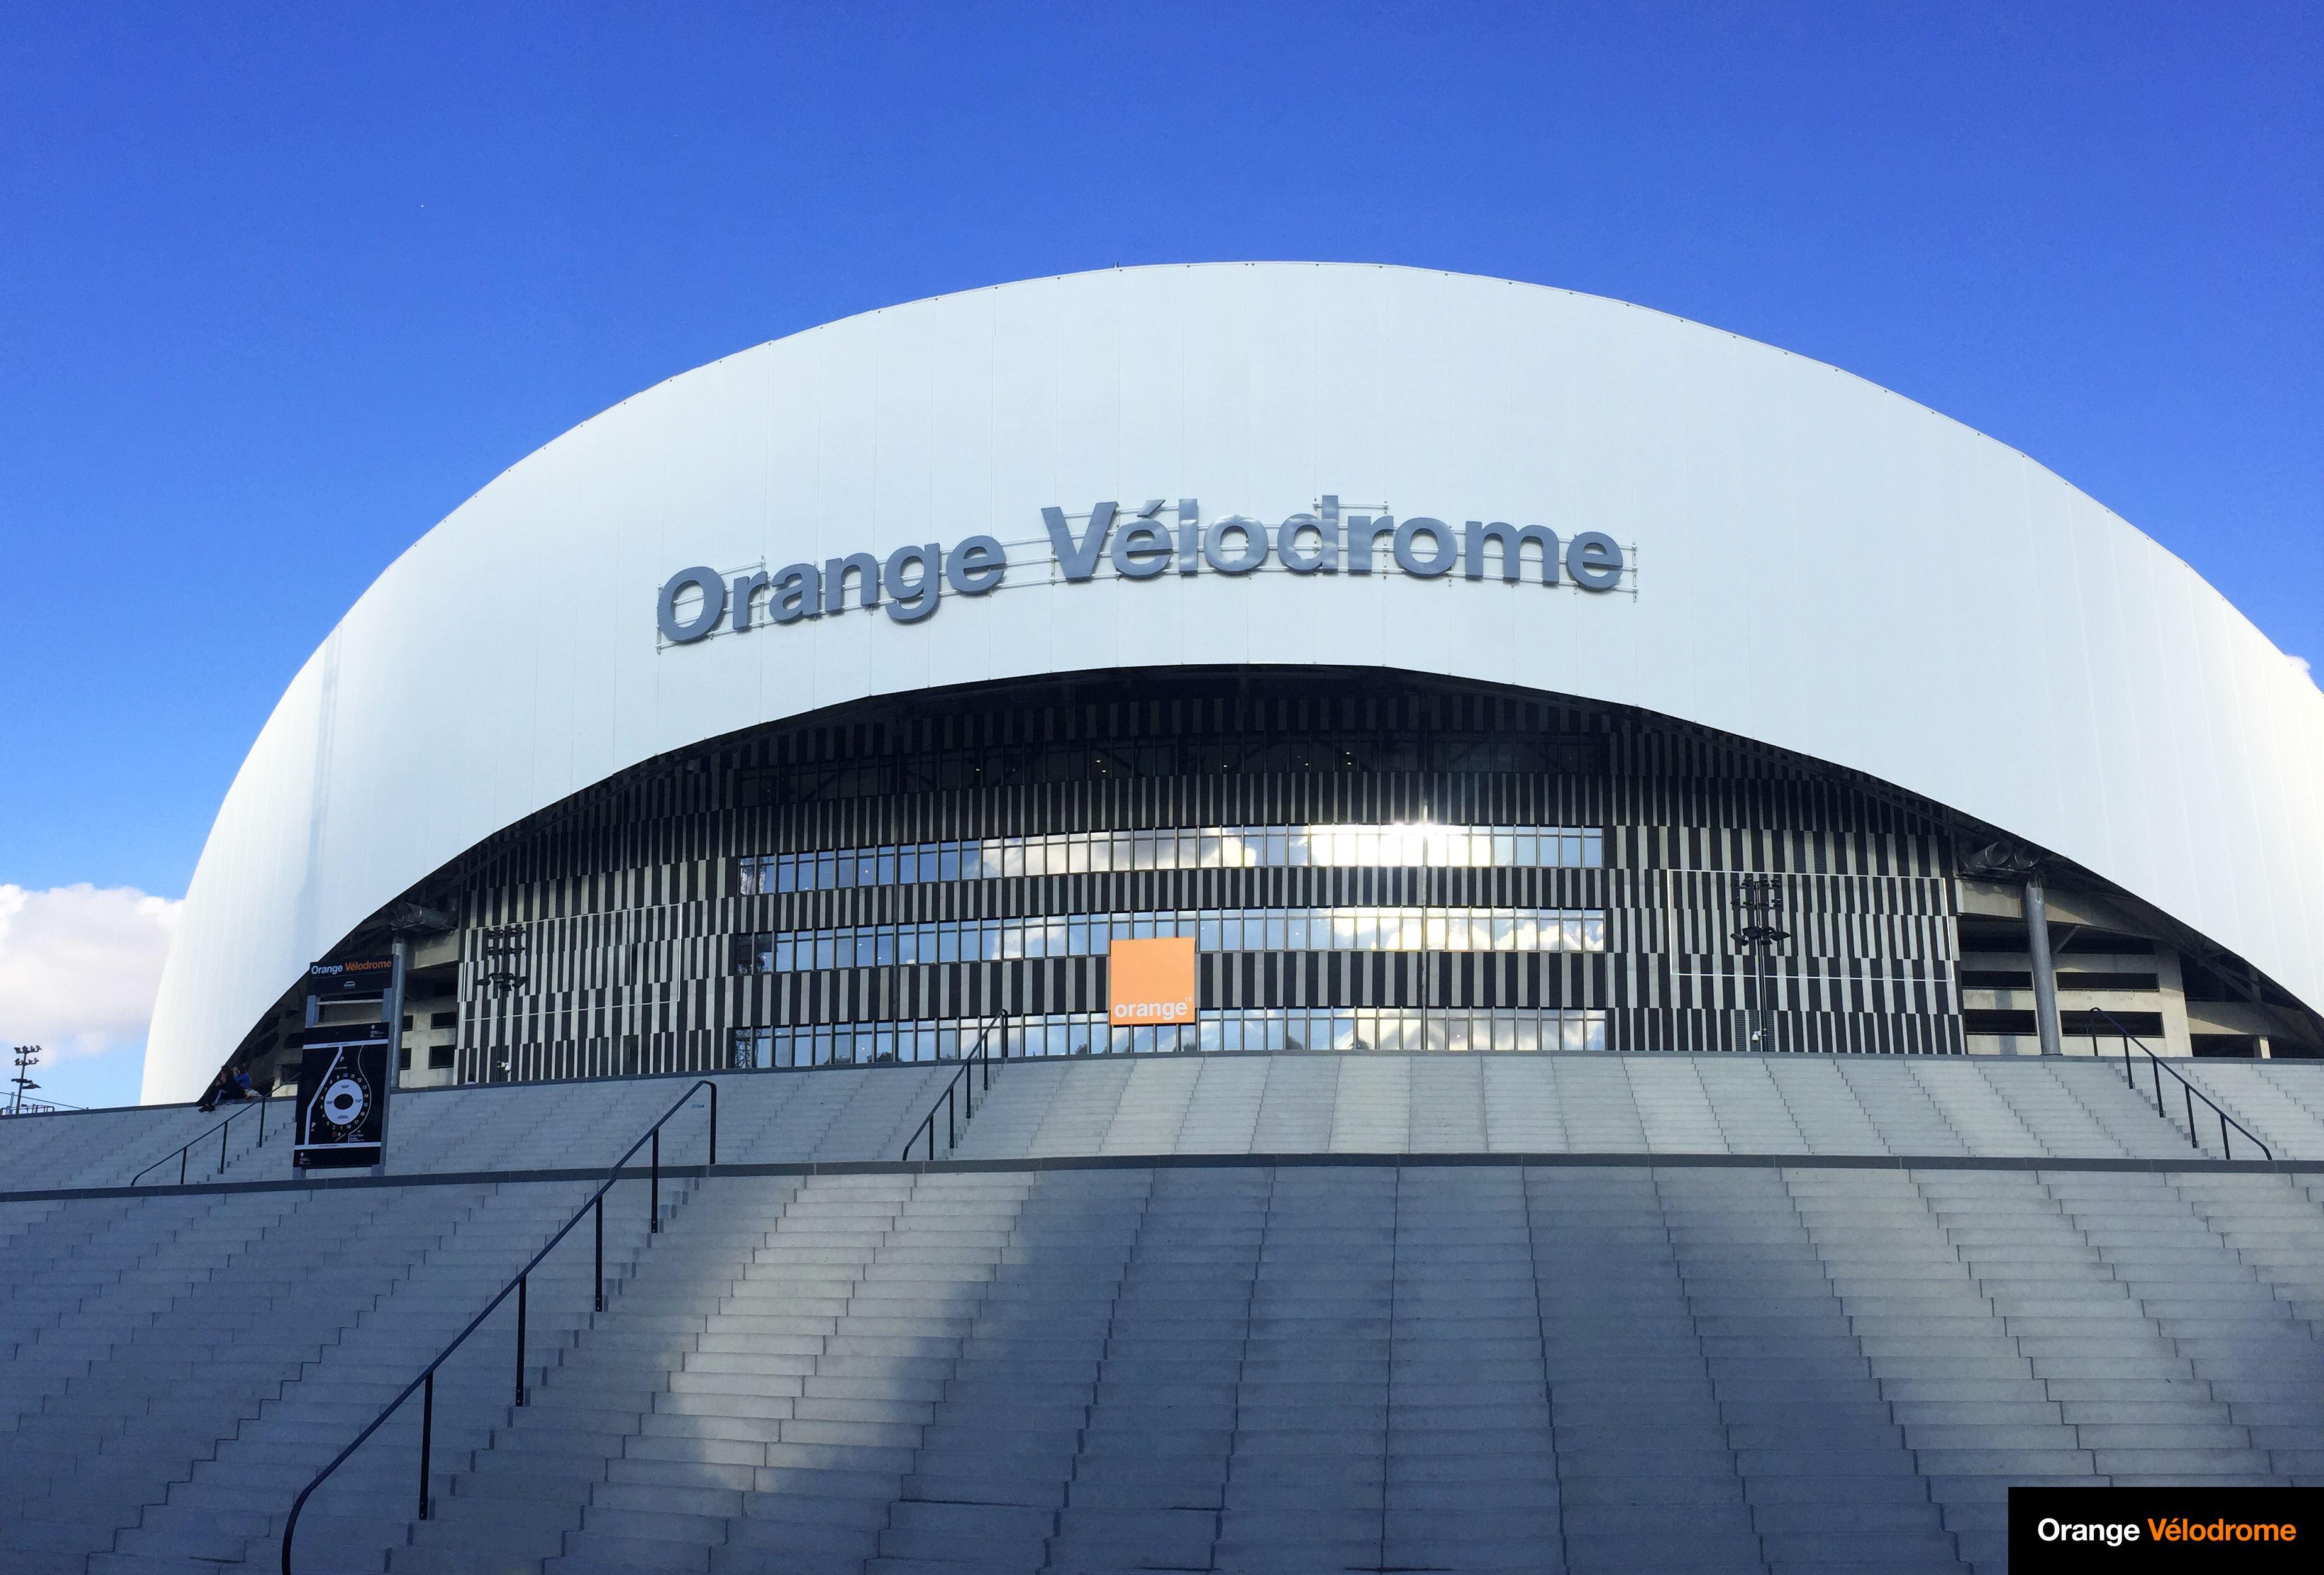 Visite Orange Vélodrome